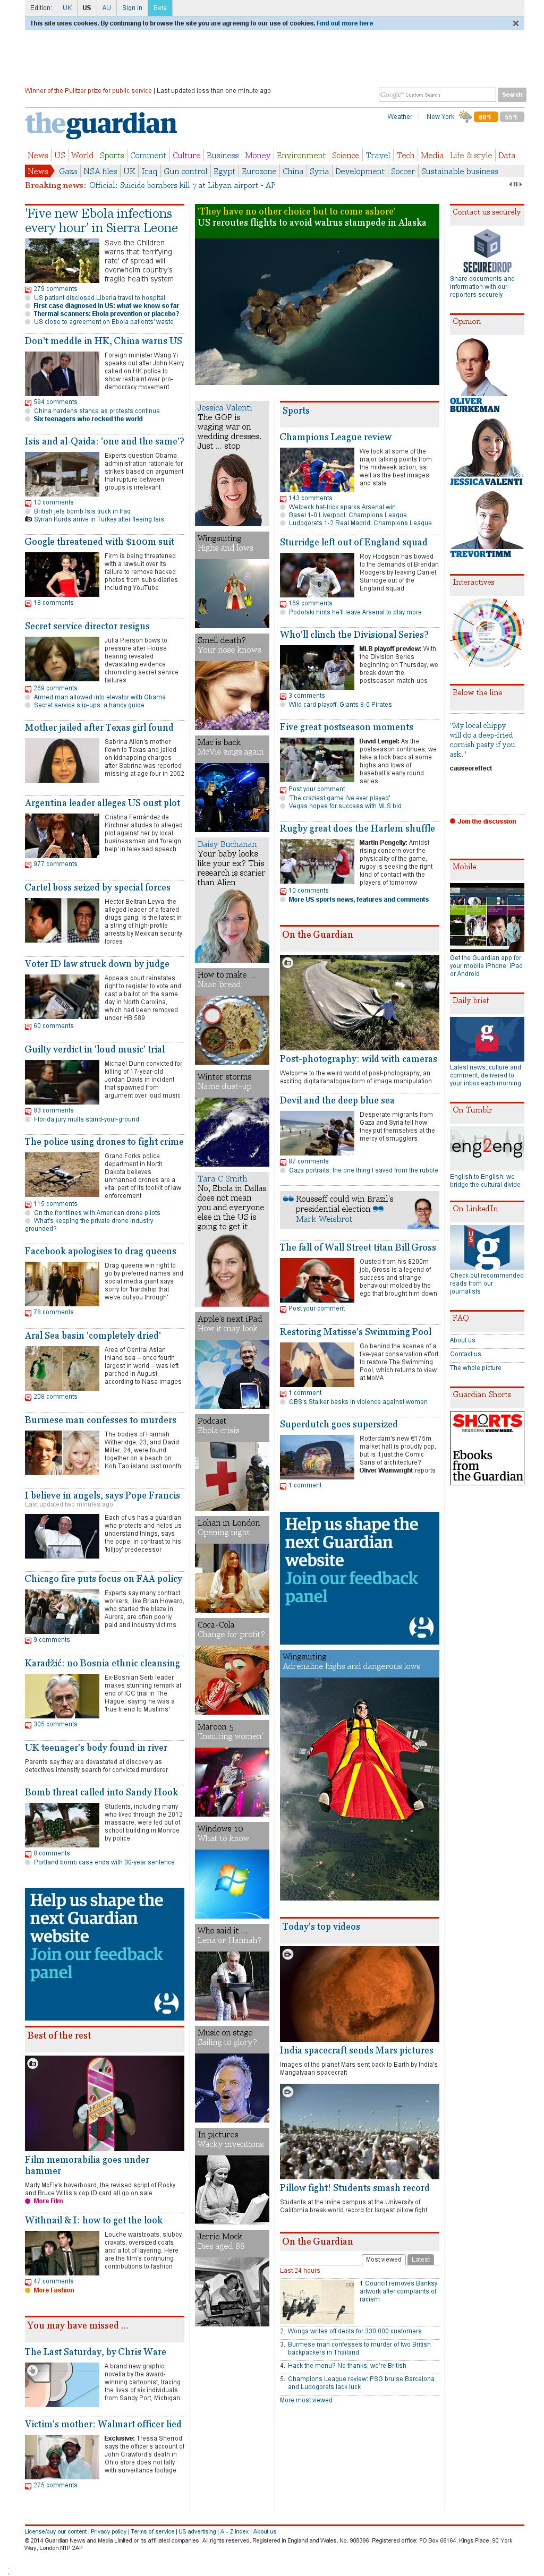 The Guardian at Thursday Oct. 2, 2014, 1:06 p.m. UTC